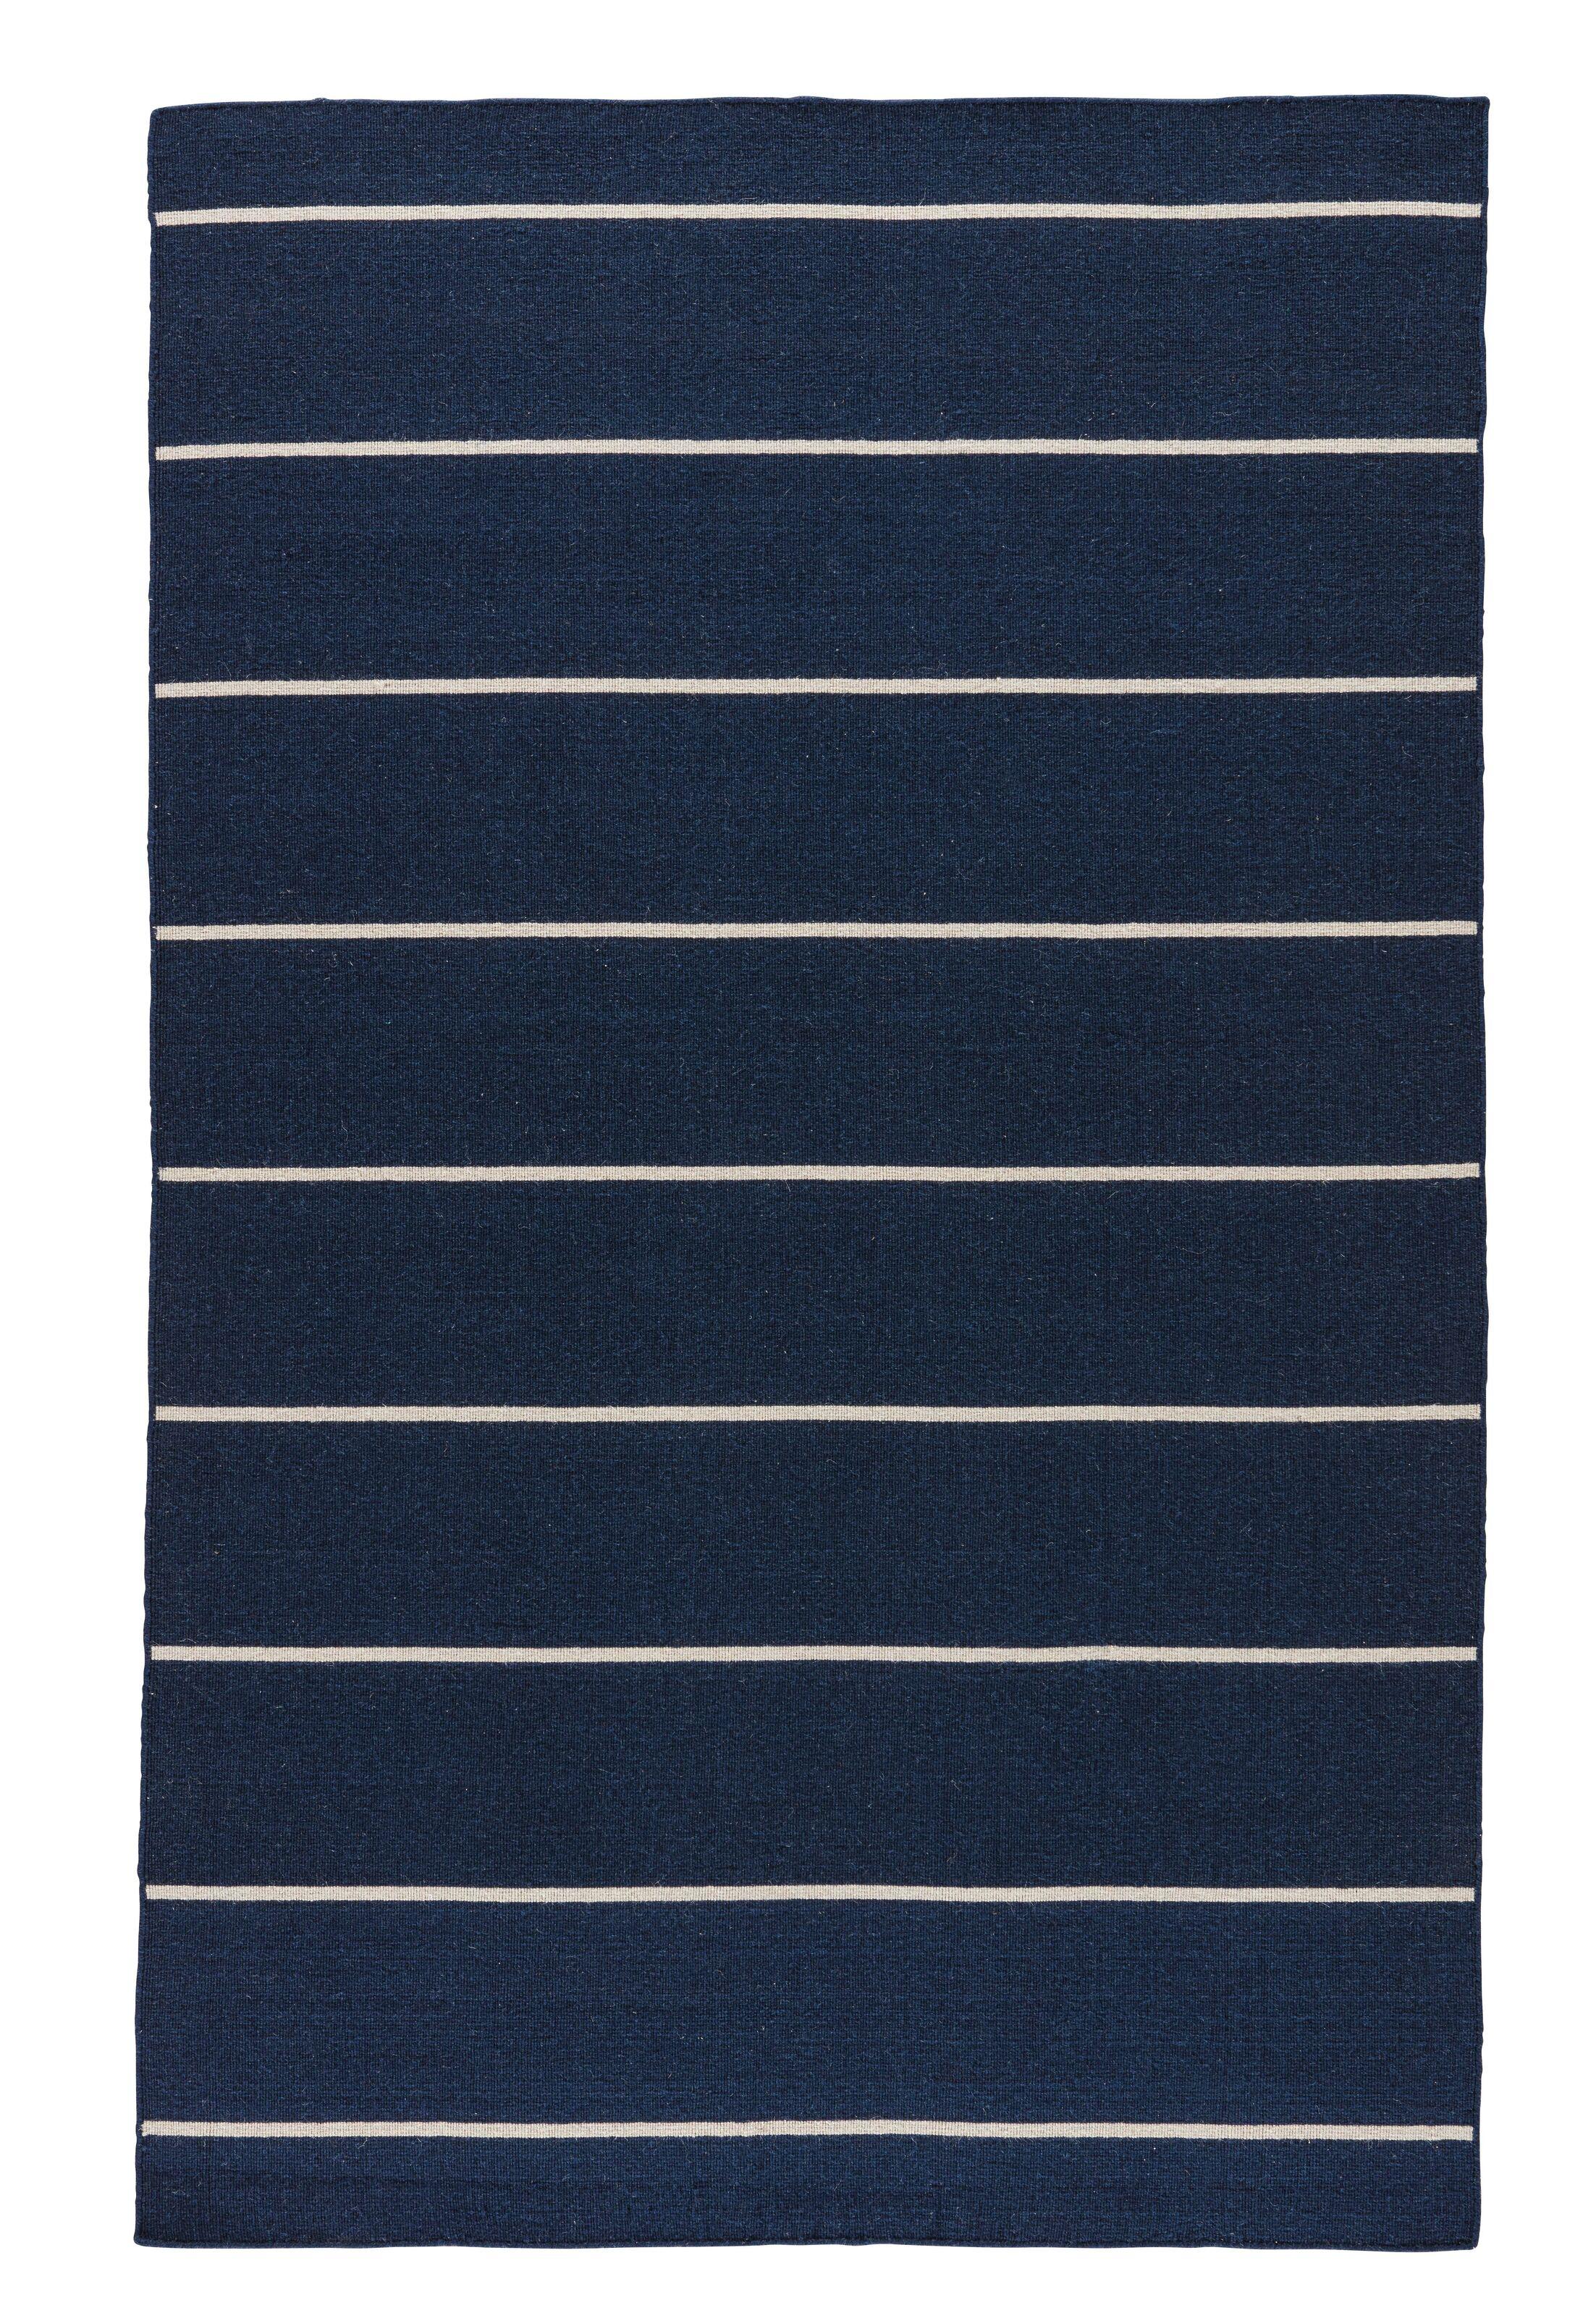 Rogan Flat-Woven Wool Blue/Ivory Area Rug Rug Size: Rectangle 8' x 10'